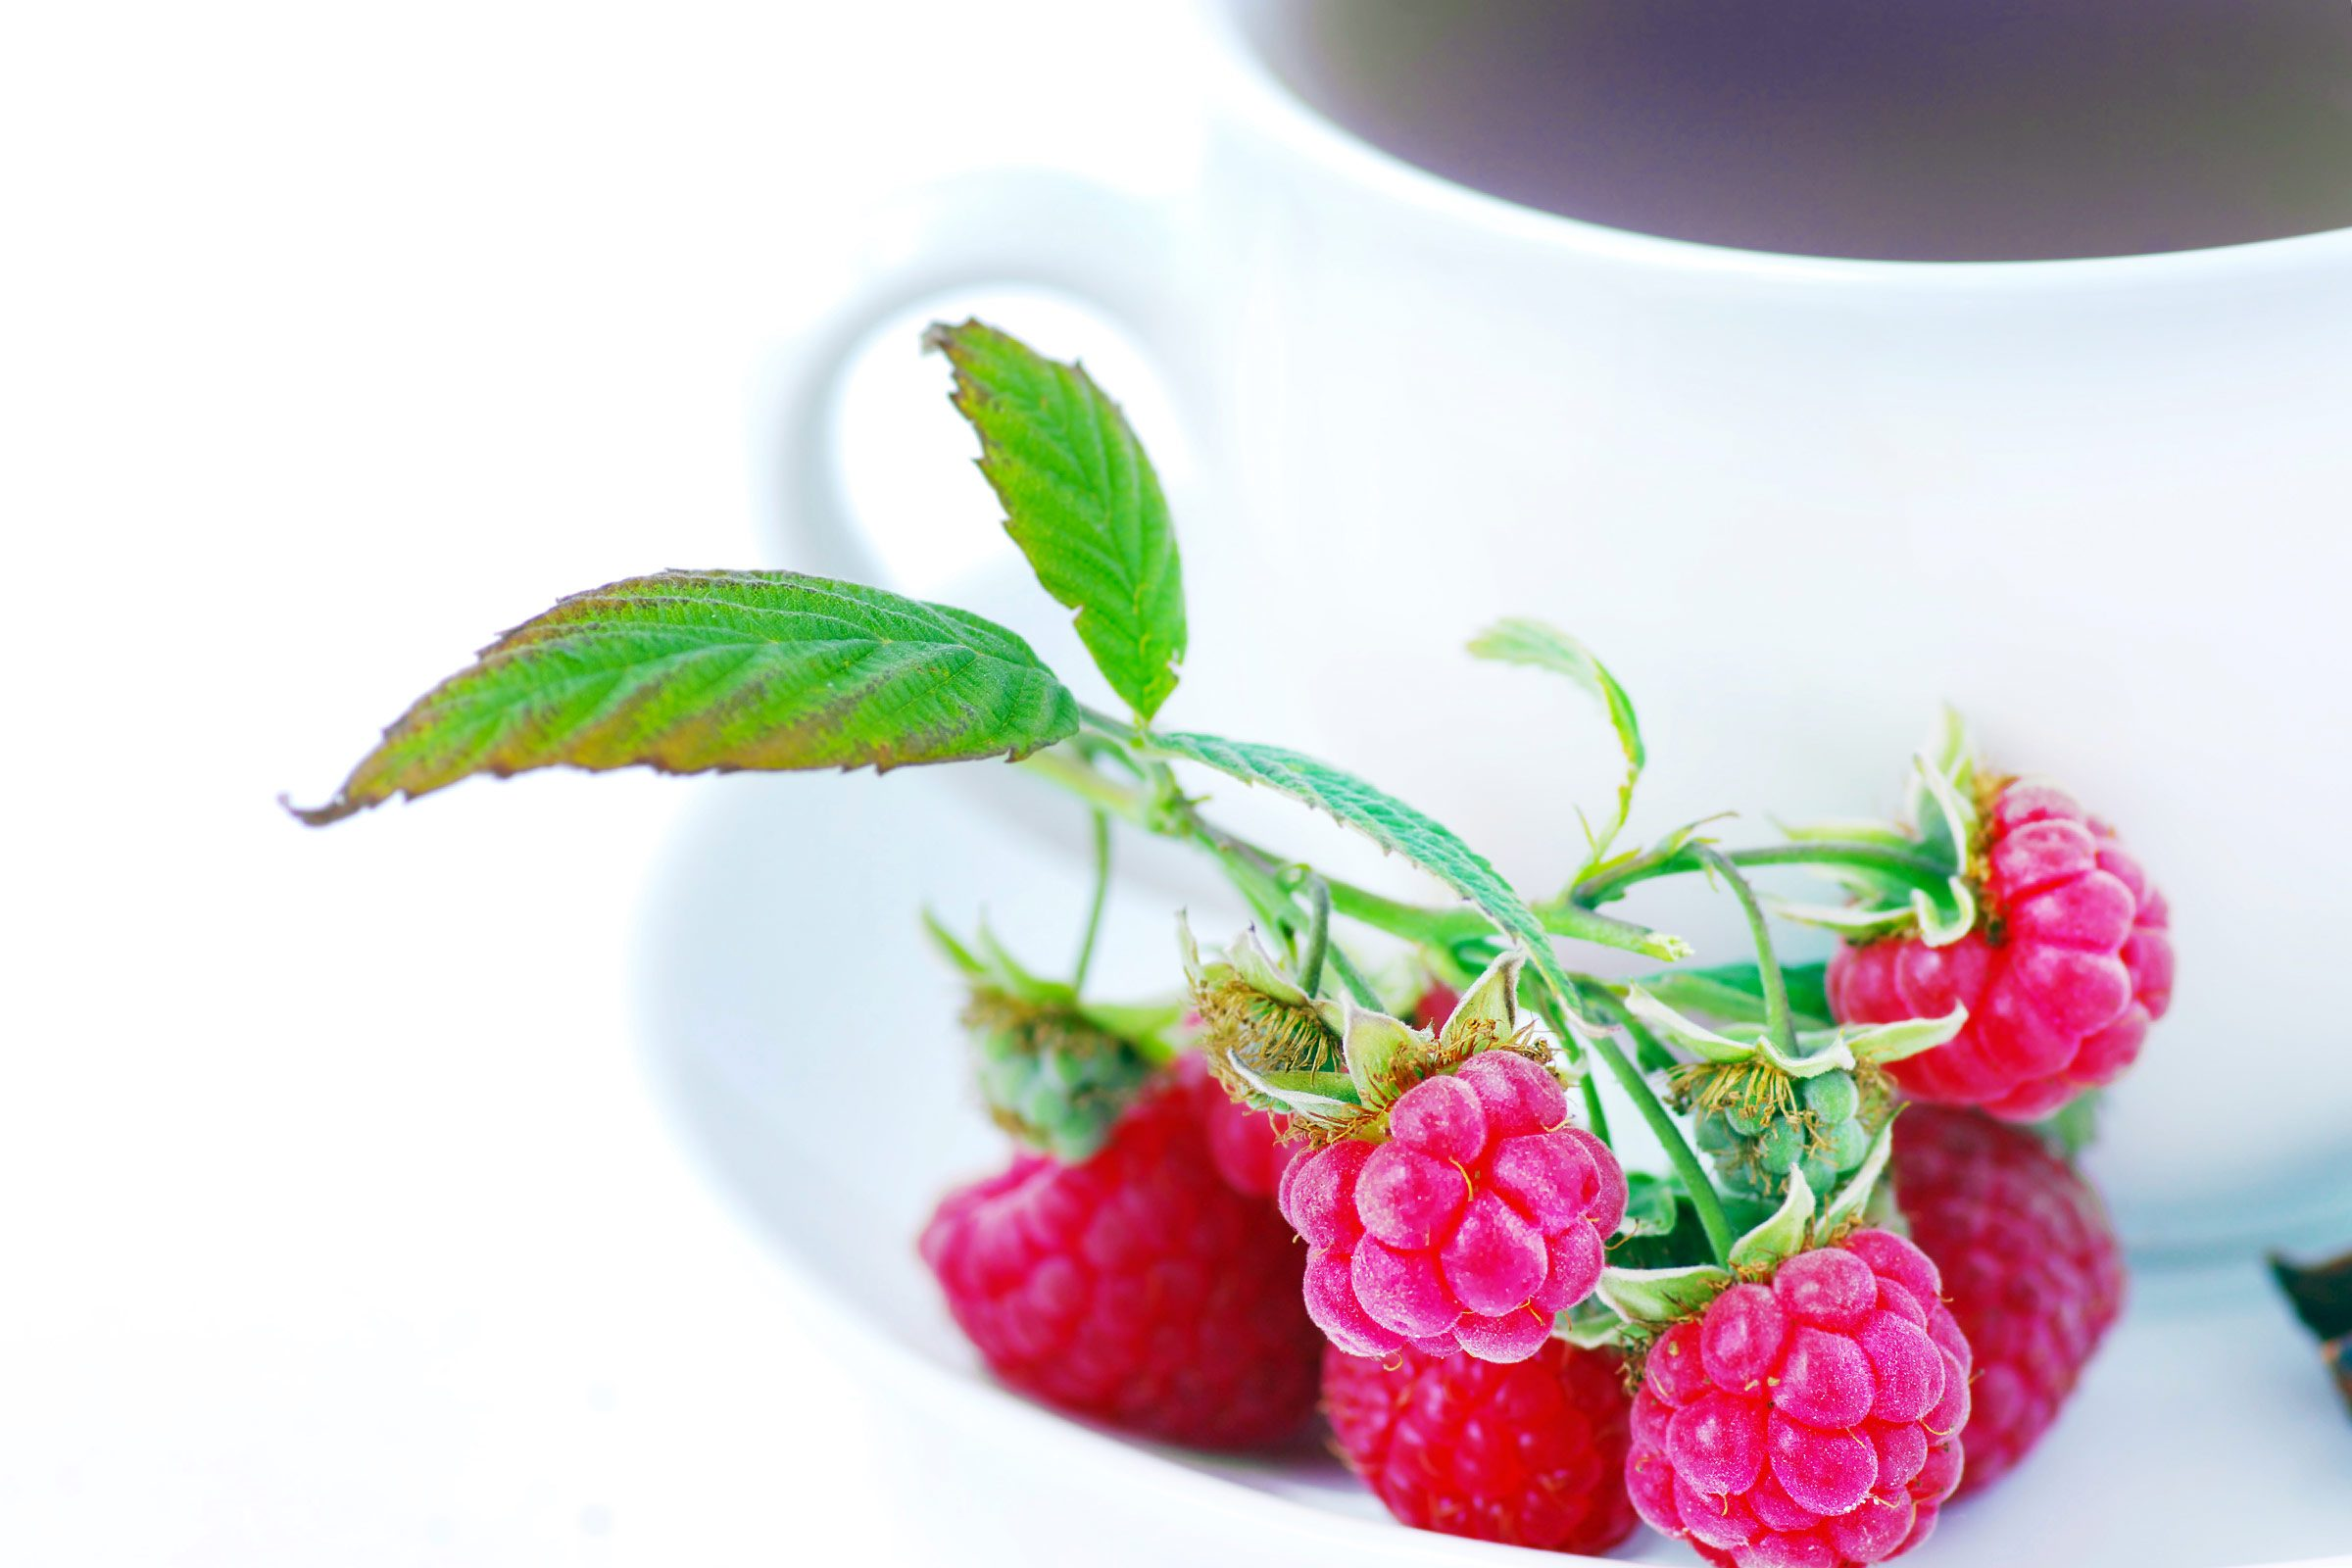 Sore throat remedy: Raspberry tea